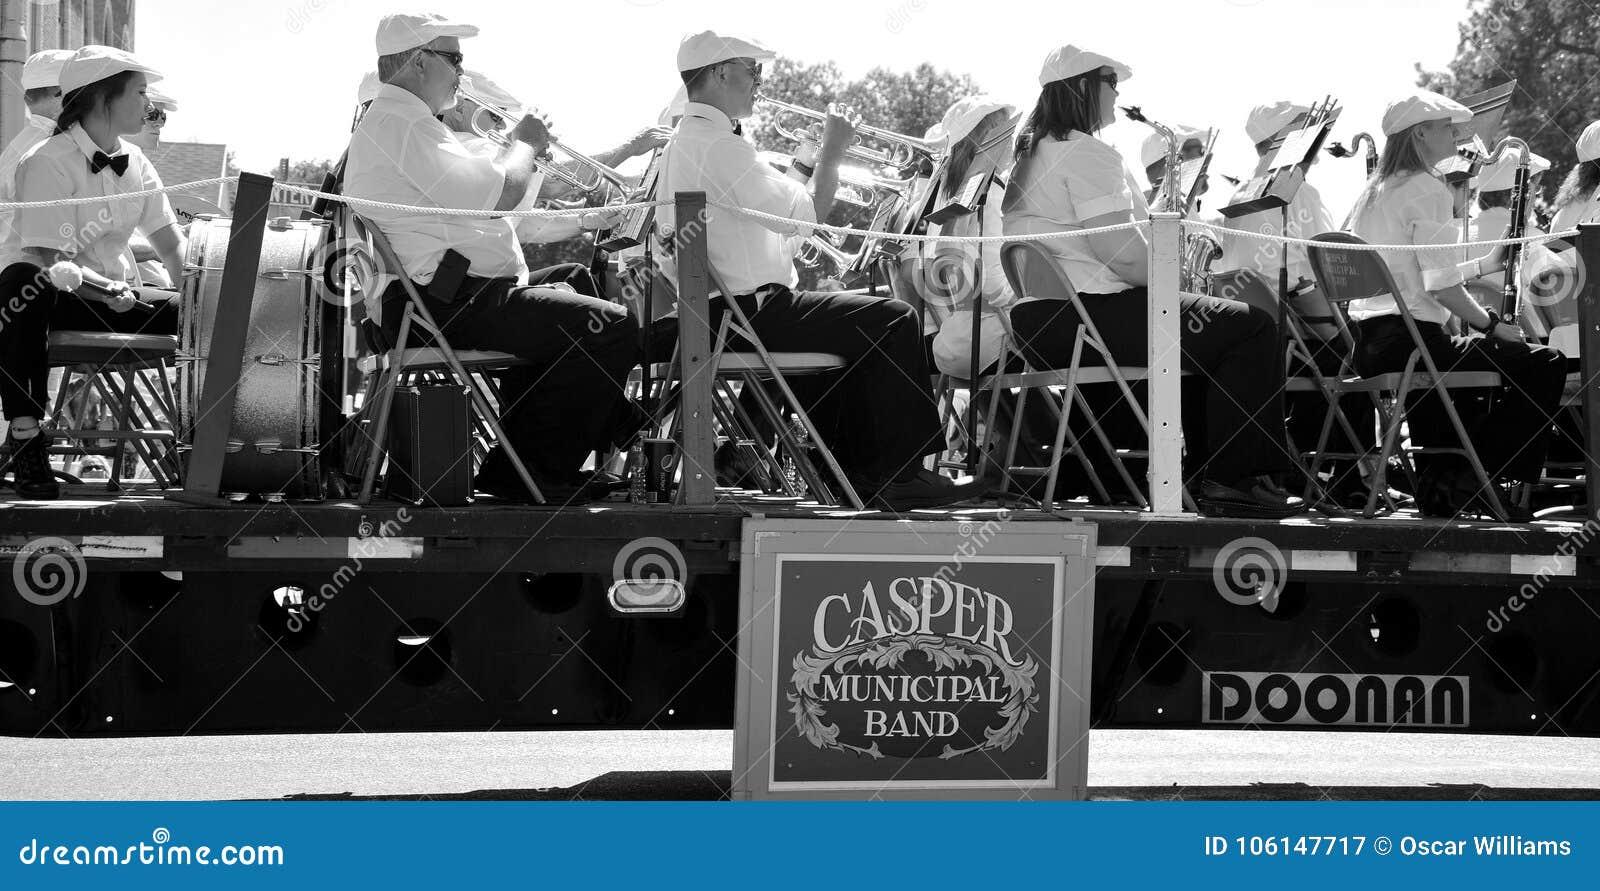 Casper Municipal Band.